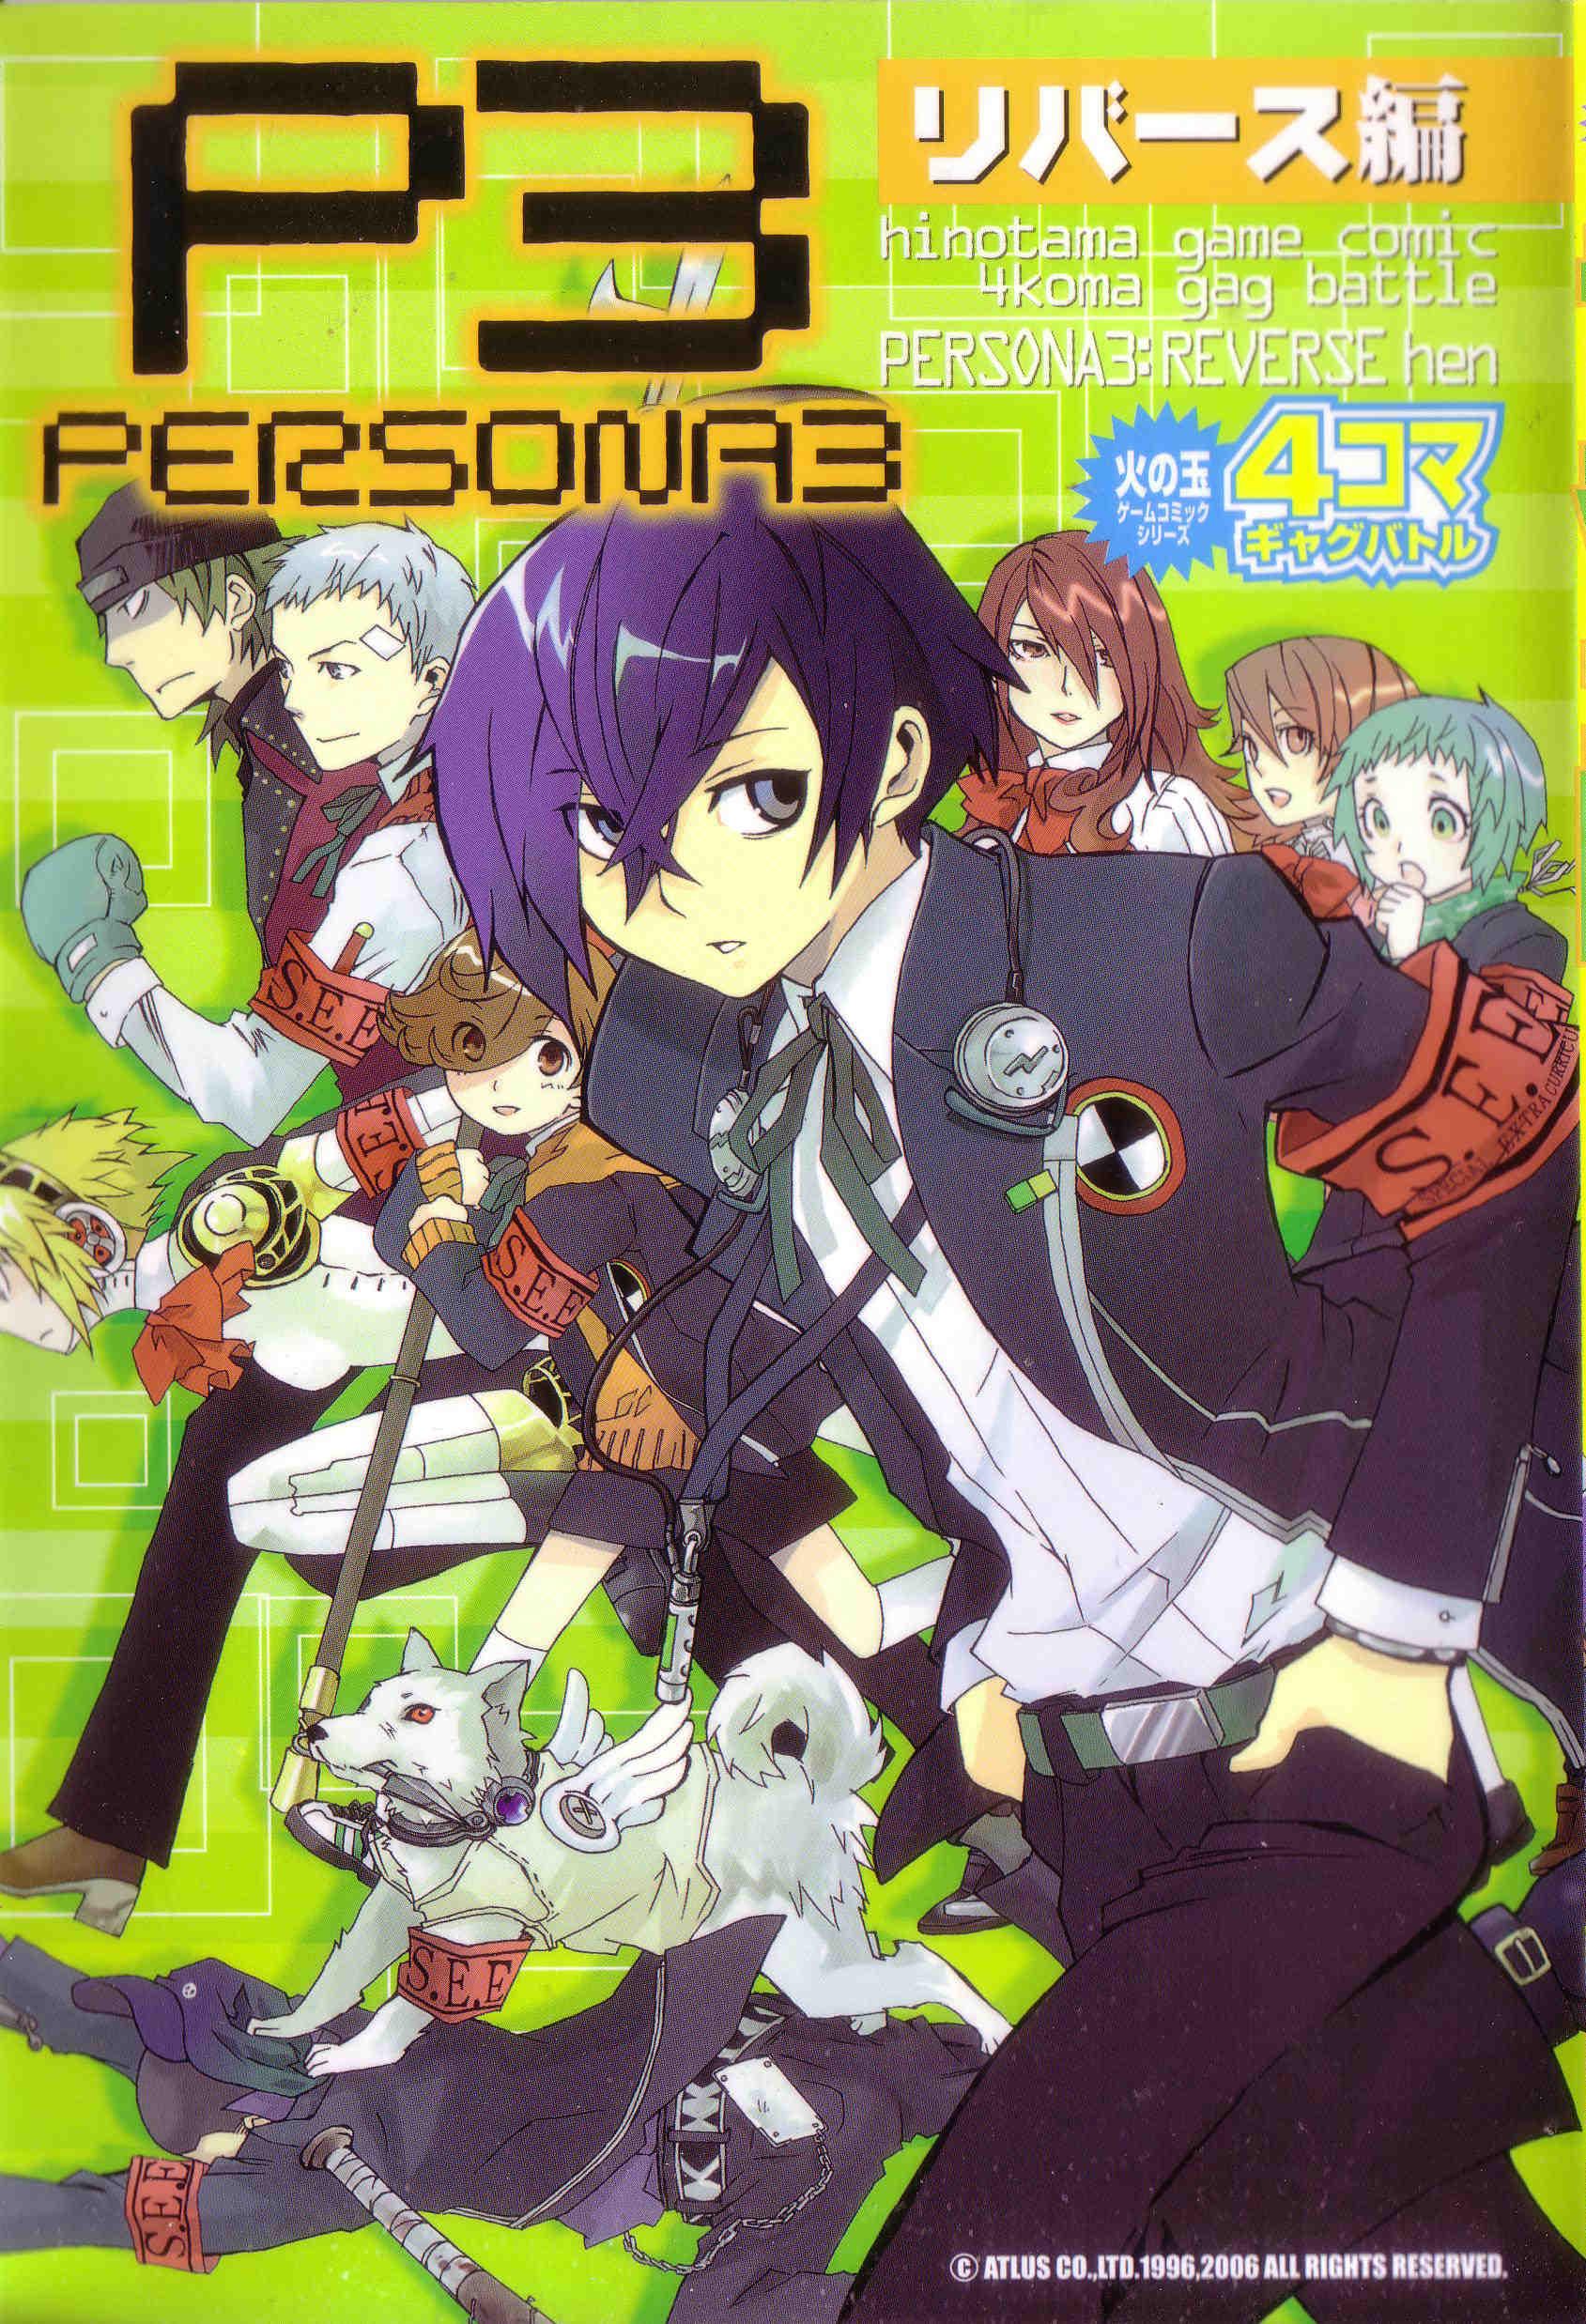 Persona 3 4koma Gag Battle